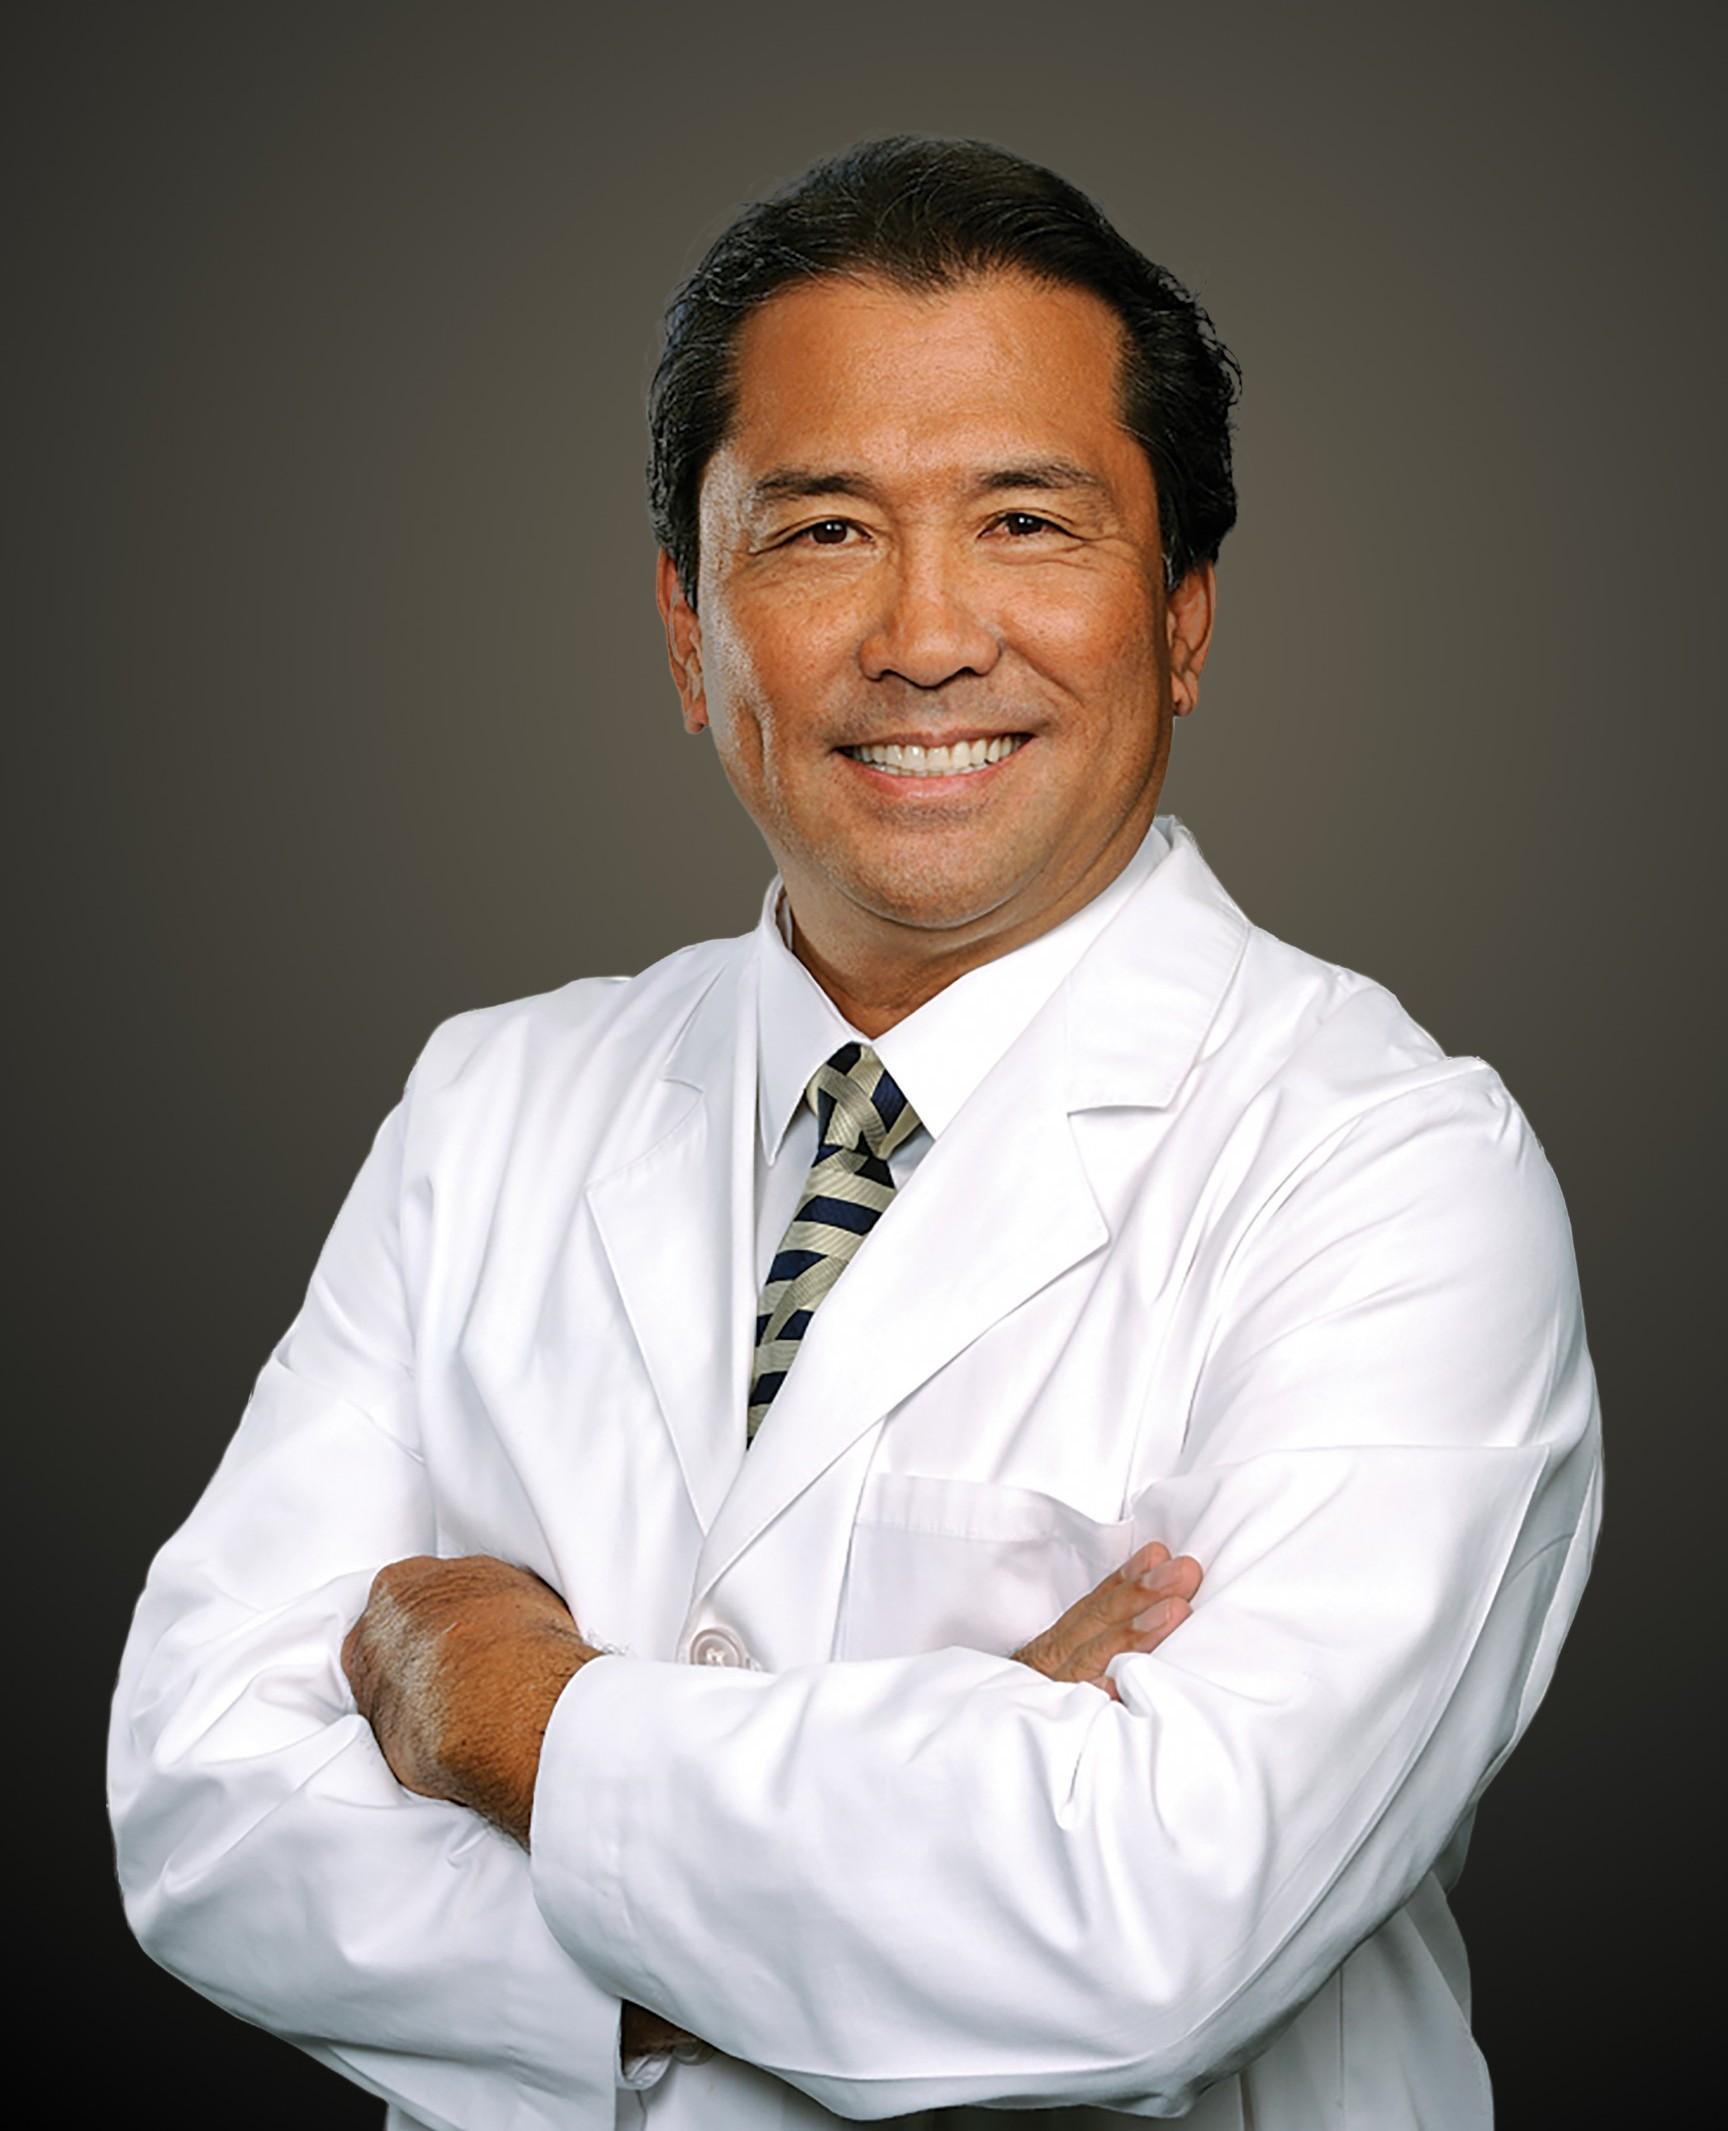 Ken Yasuhara, D.D.S.